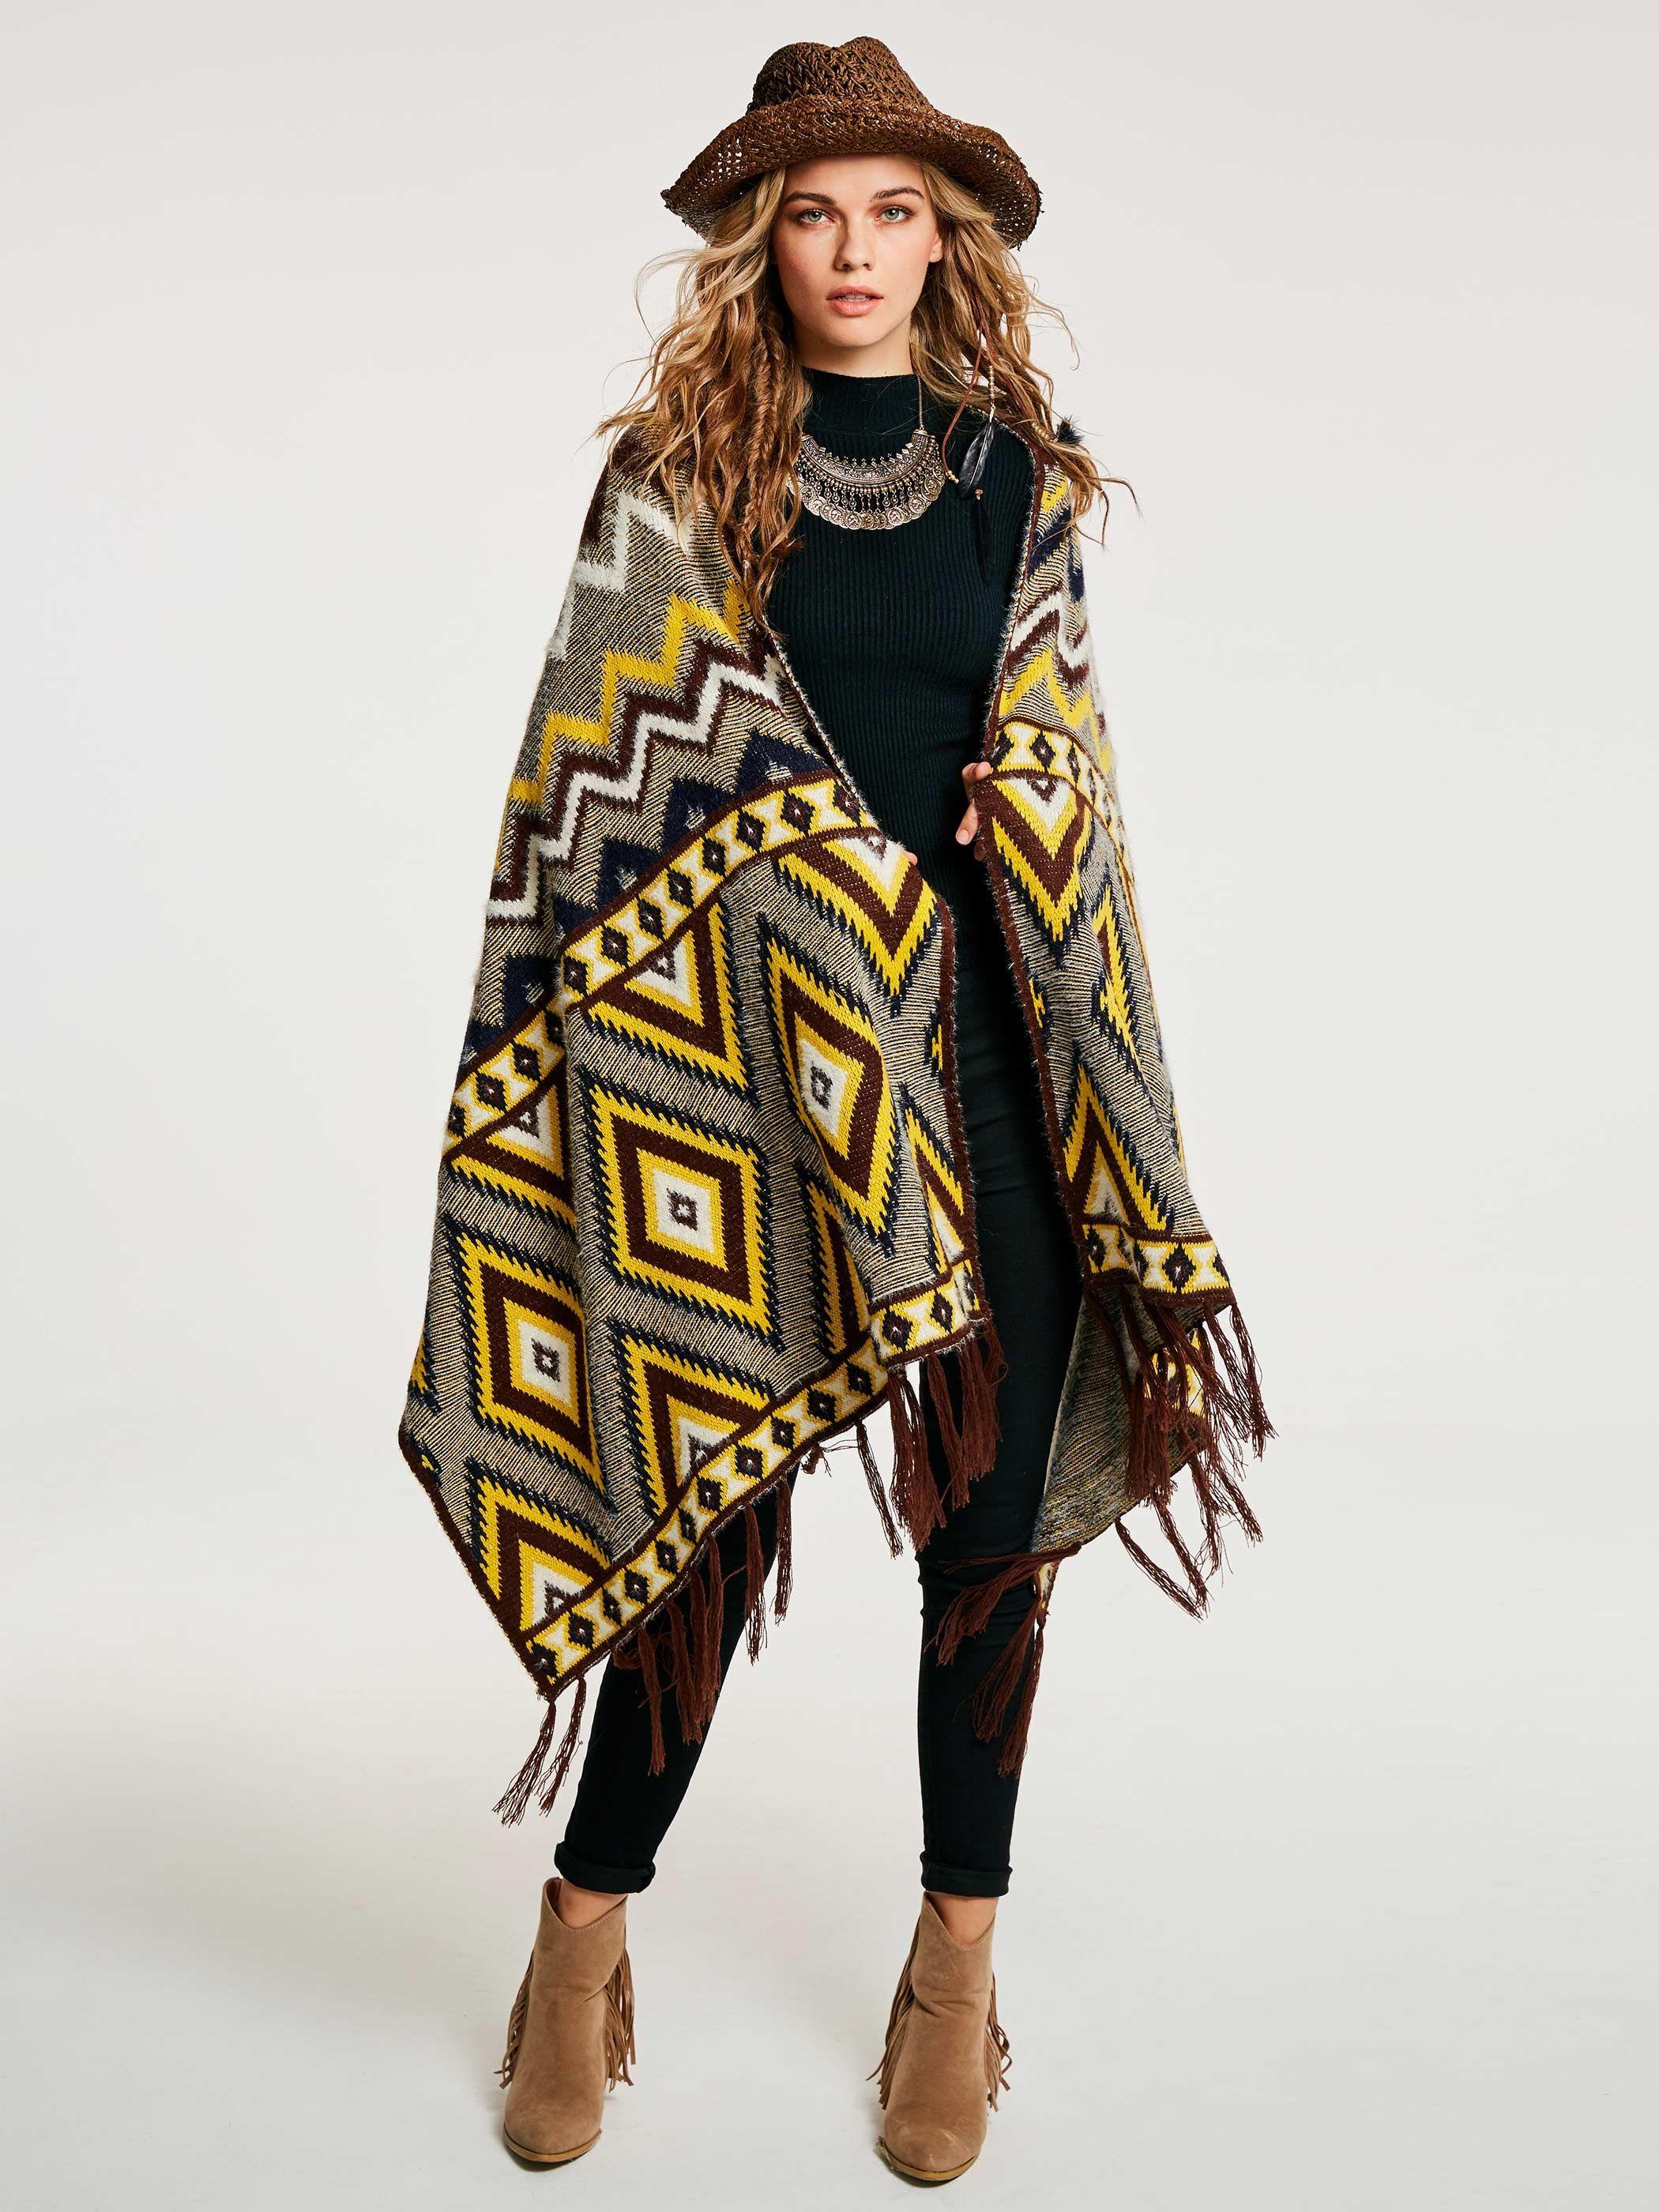 d972343ac5 Color Block Geometric Pattern Wrapped Women's Cape | Jackets / Coats ...